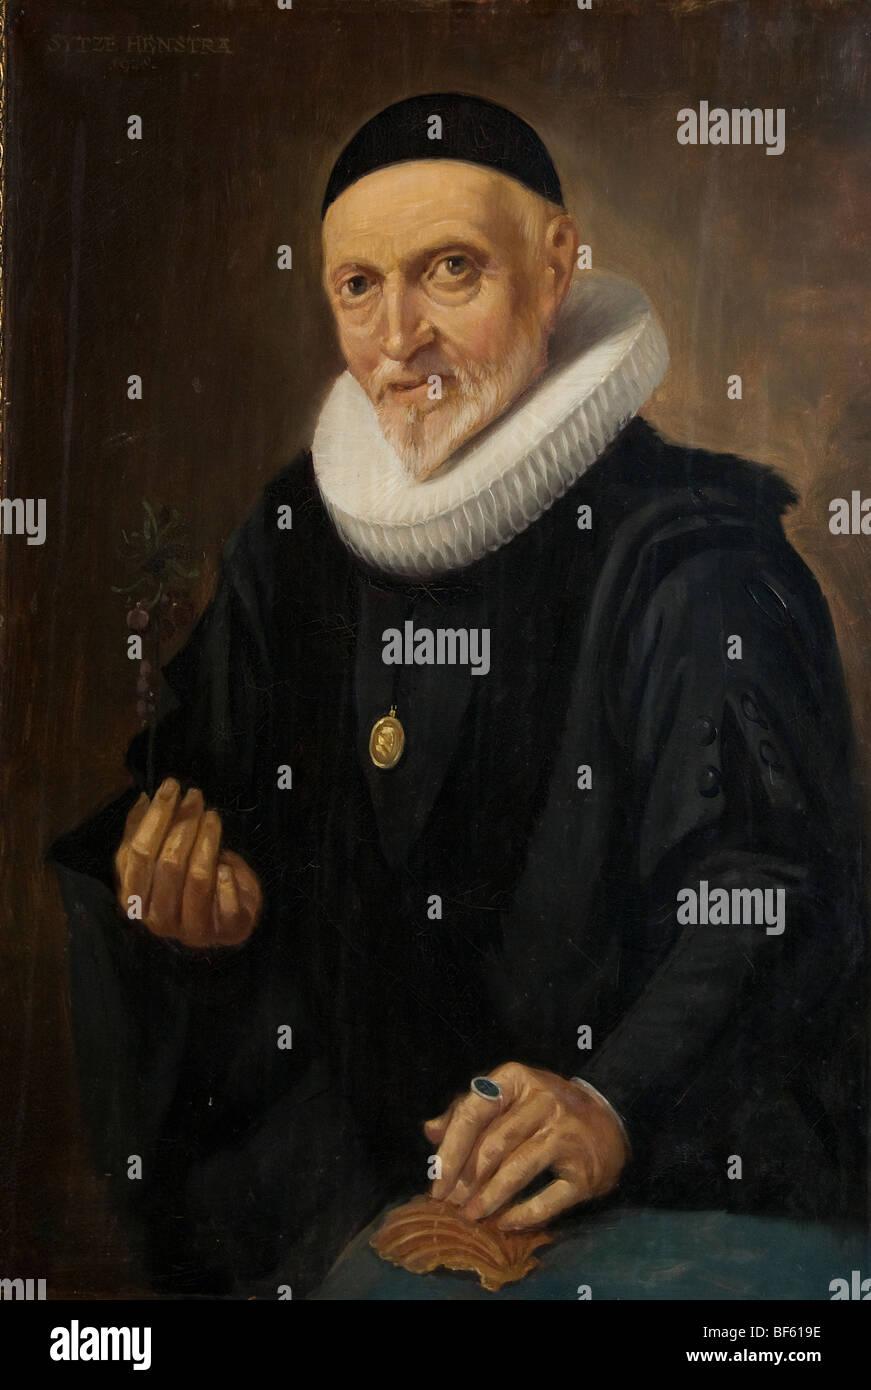 Chirurghijn surgery surgeon Museum Hoorn Netherlands Holland VOC Golden Age - Stock Image